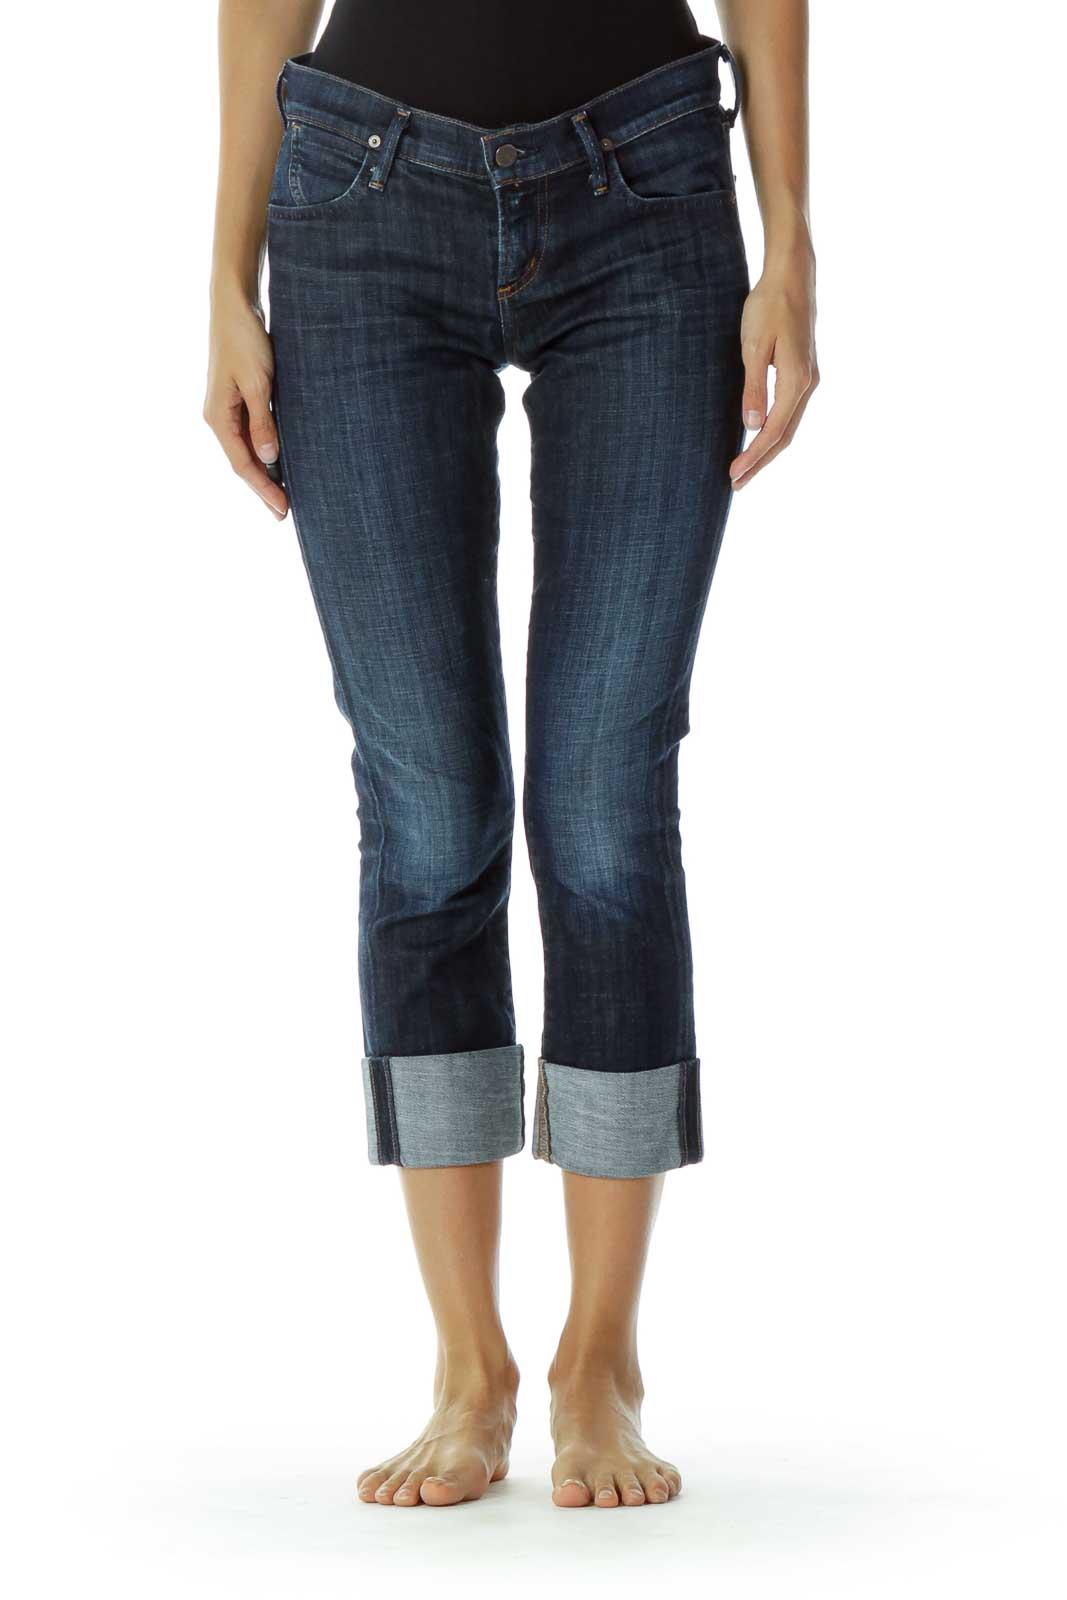 Denim Straight-Leg Jeans Front